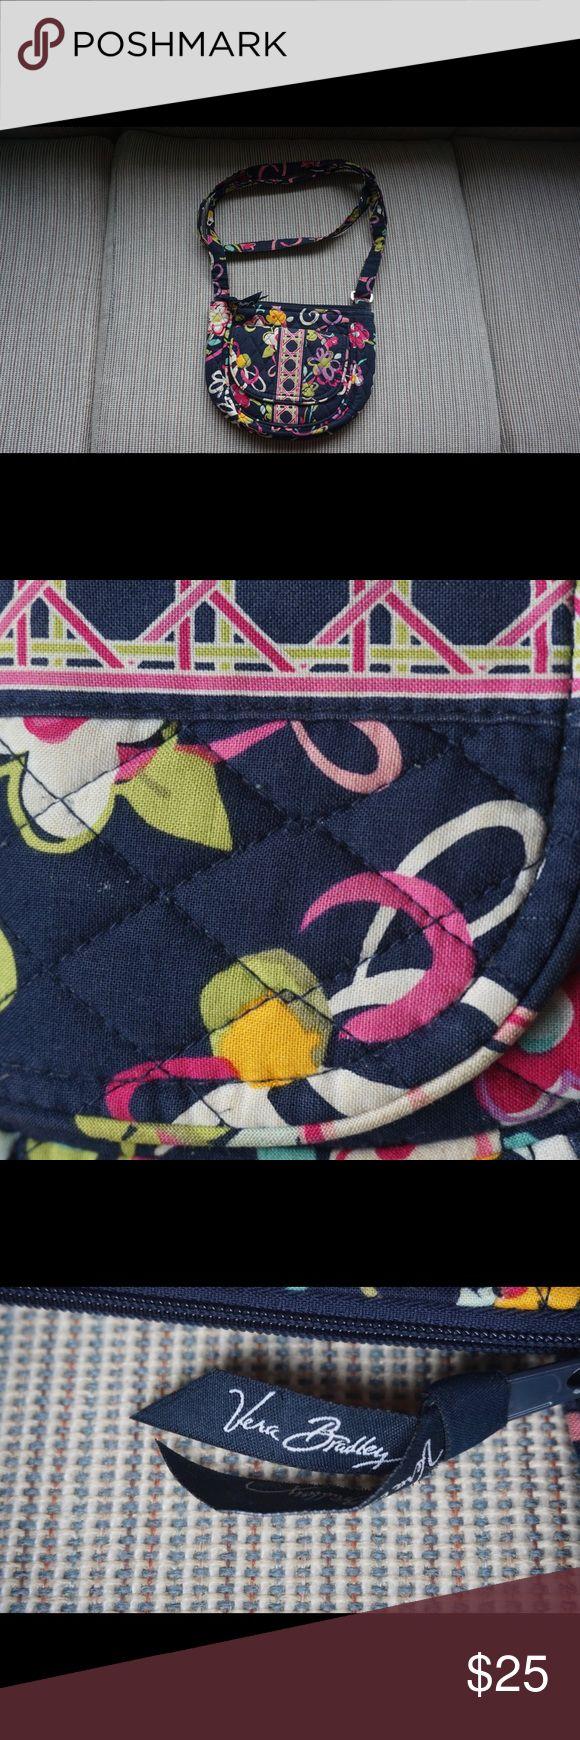 Selling this Vera Bradley Hipster Crossbody Bag in Ribbons Bag on Poshmark! My username is: emilypapaz. #shopmycloset #poshmark #fashion #shopping #style #forsale #Vera Bradley #Handbags